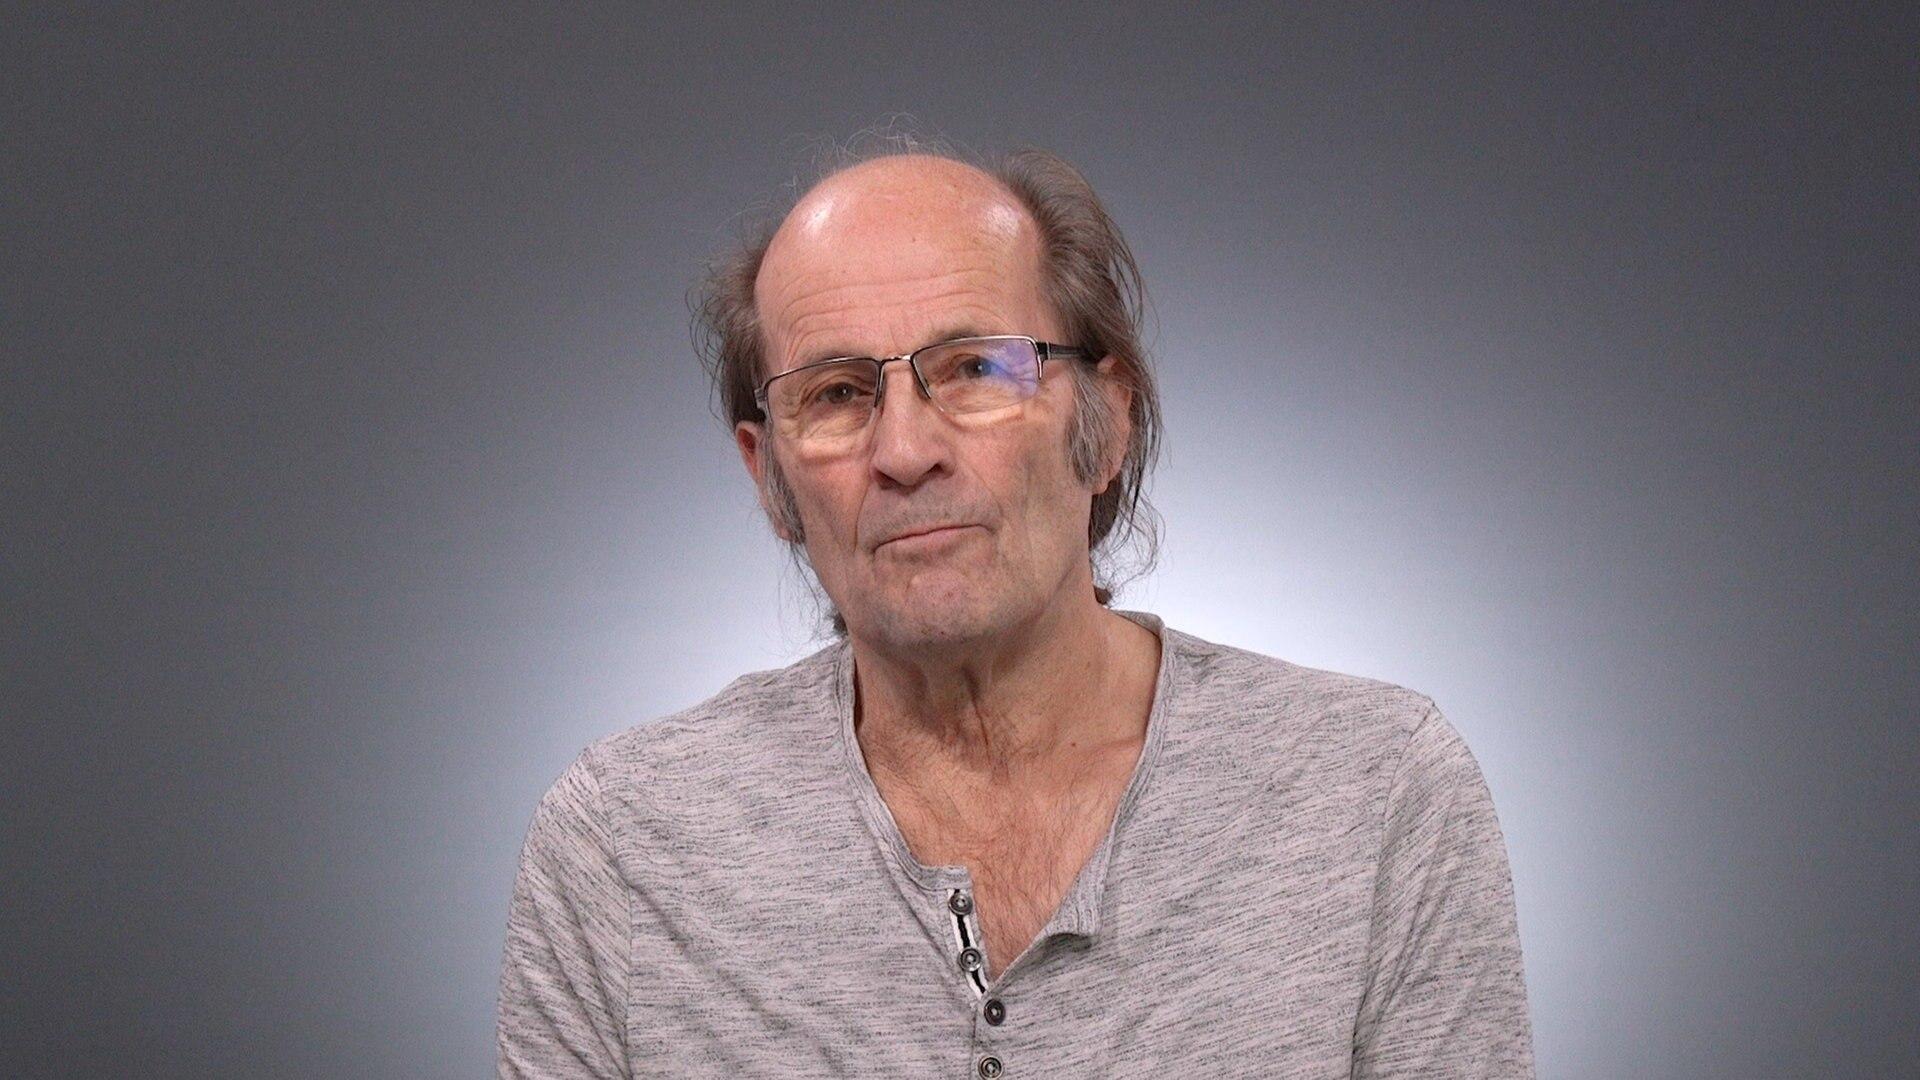 Wolfgang-Dietrich Thürnagel, PIRATEN